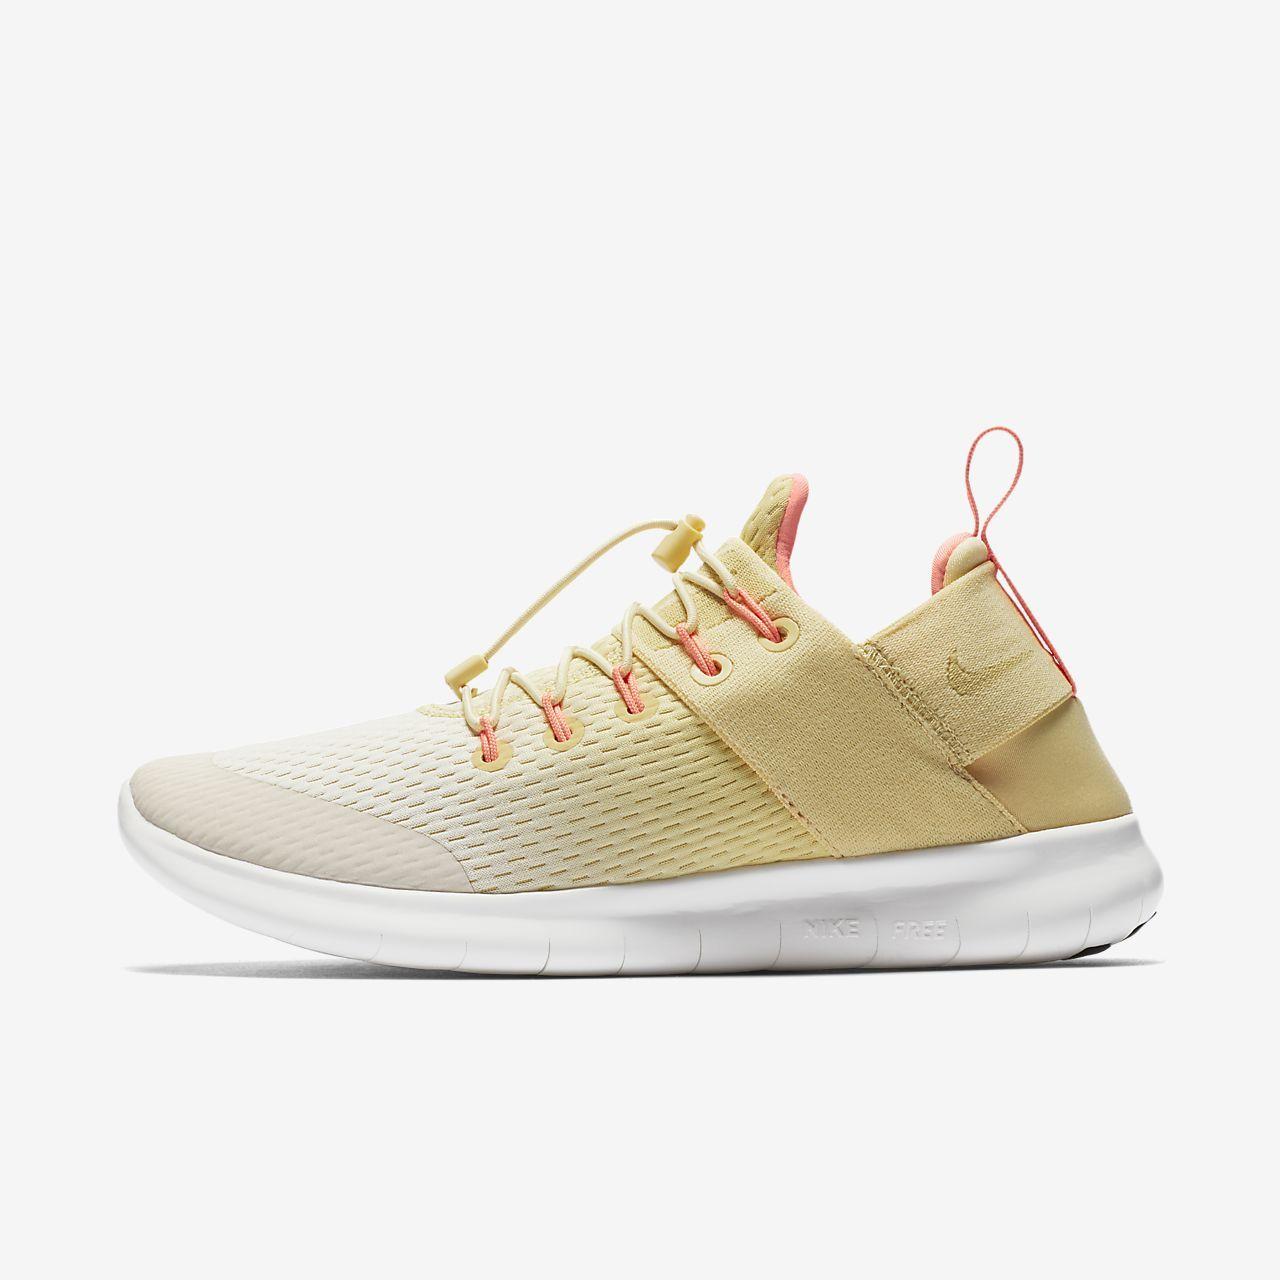 nike free rn 2017 zapatillas de running - mujer